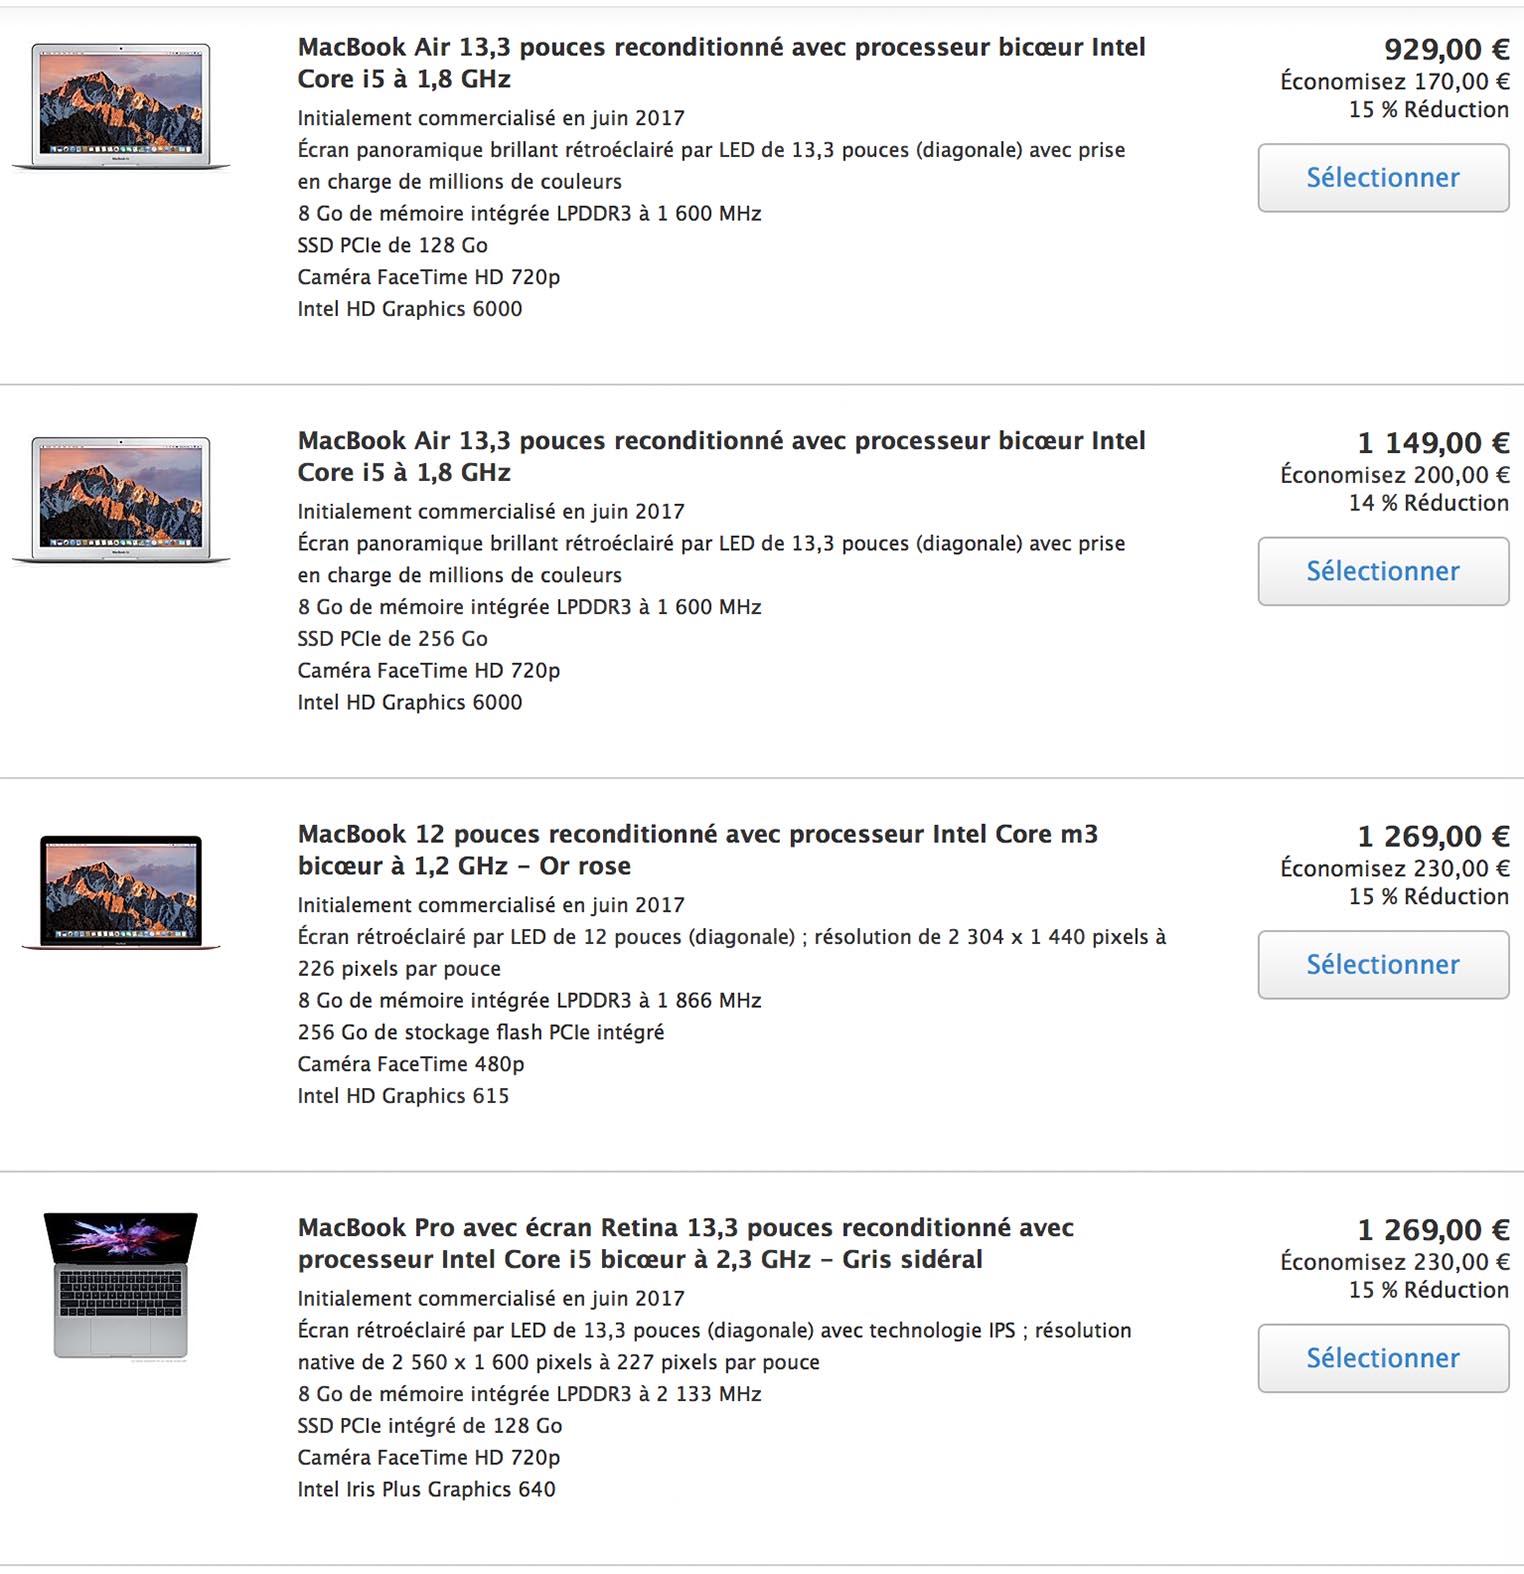 MacBook Refurb Store